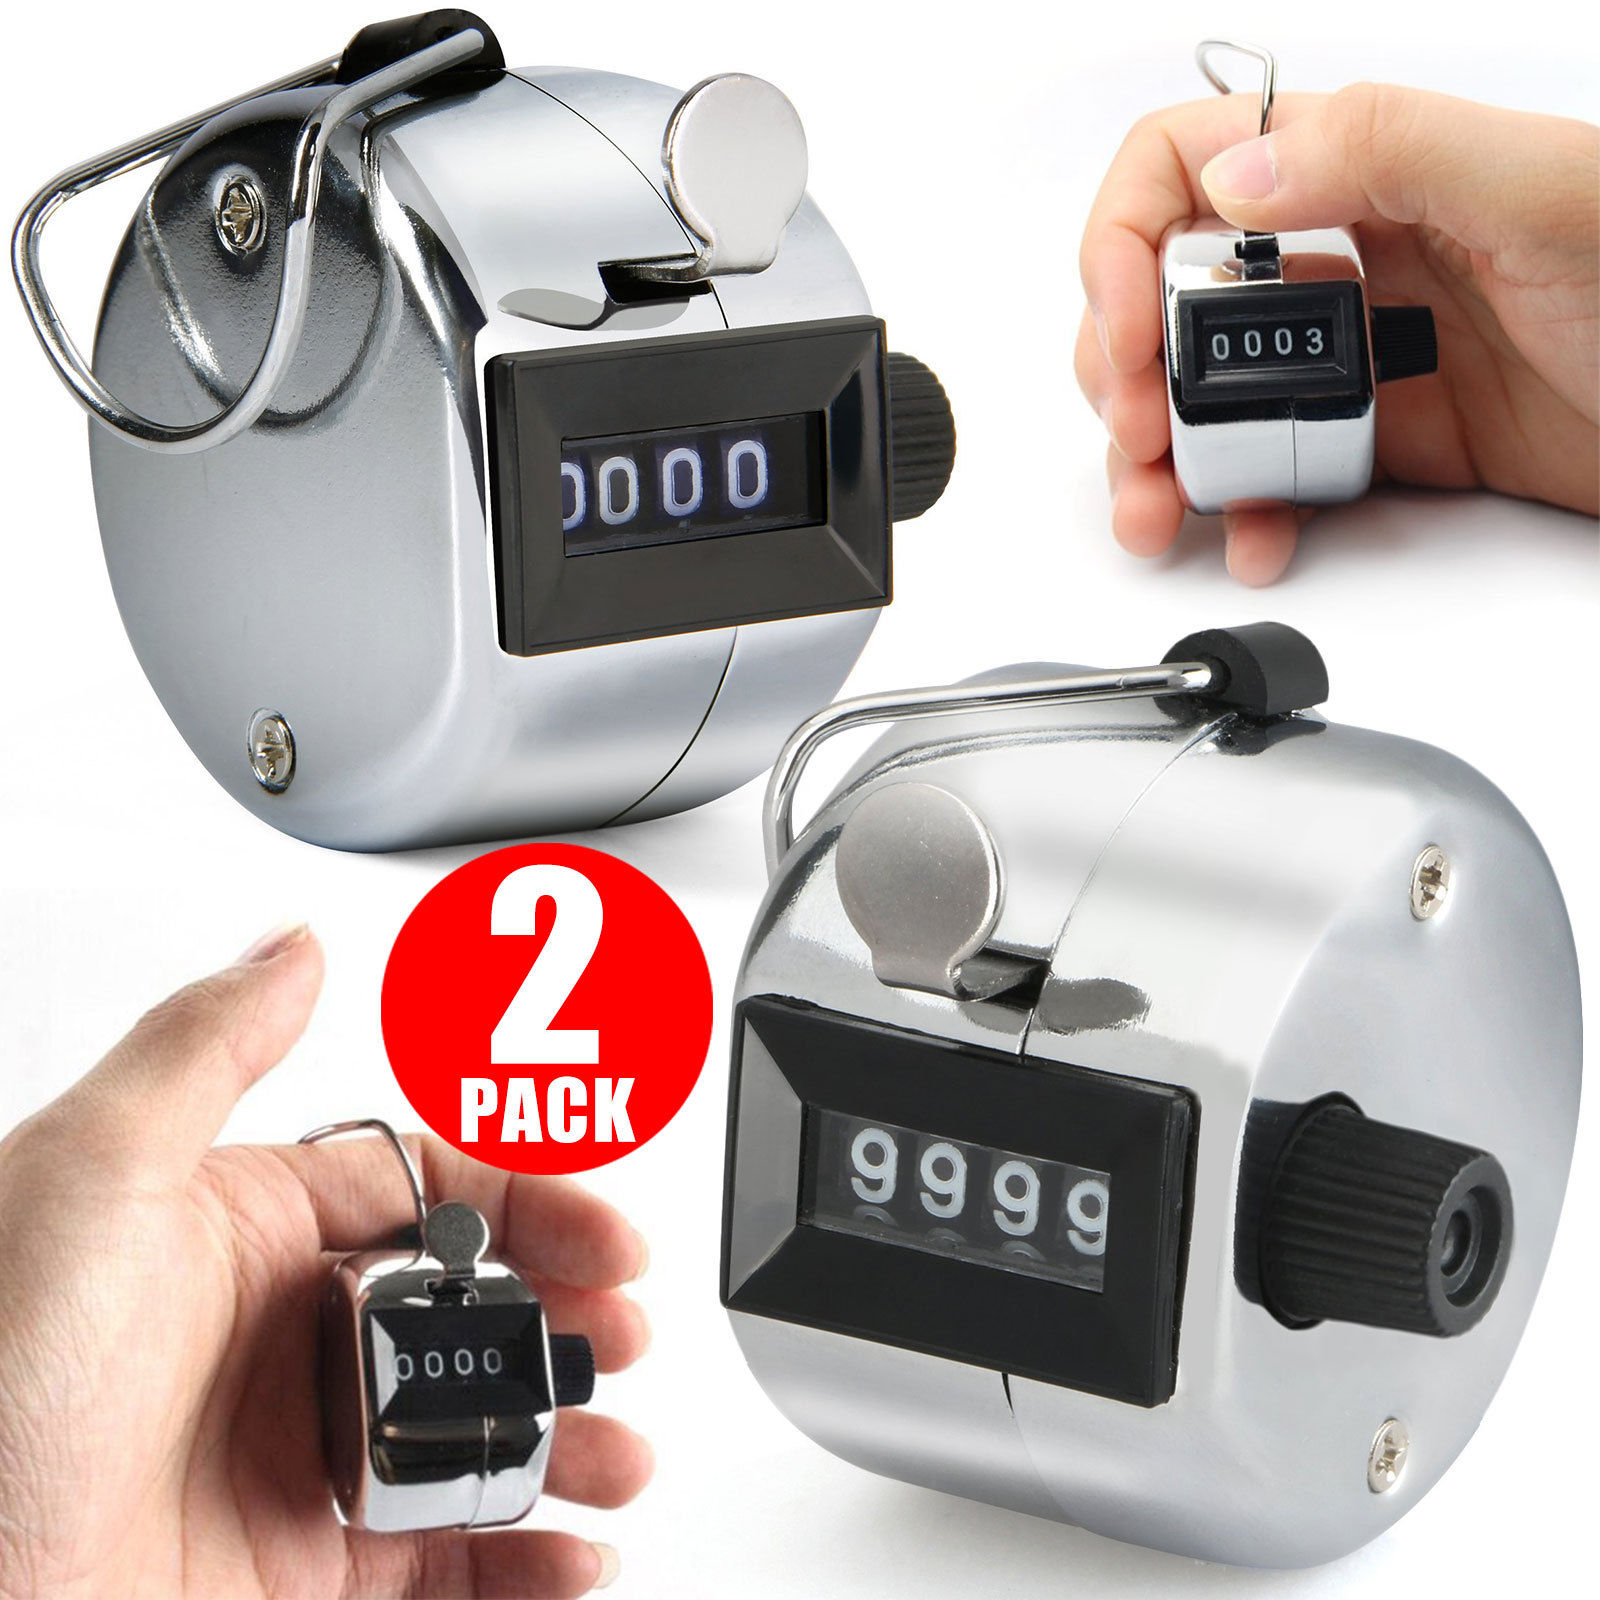 Metal Case Mechanical Clicker Digital Handheld Tall Amble Tally Clicker Counter